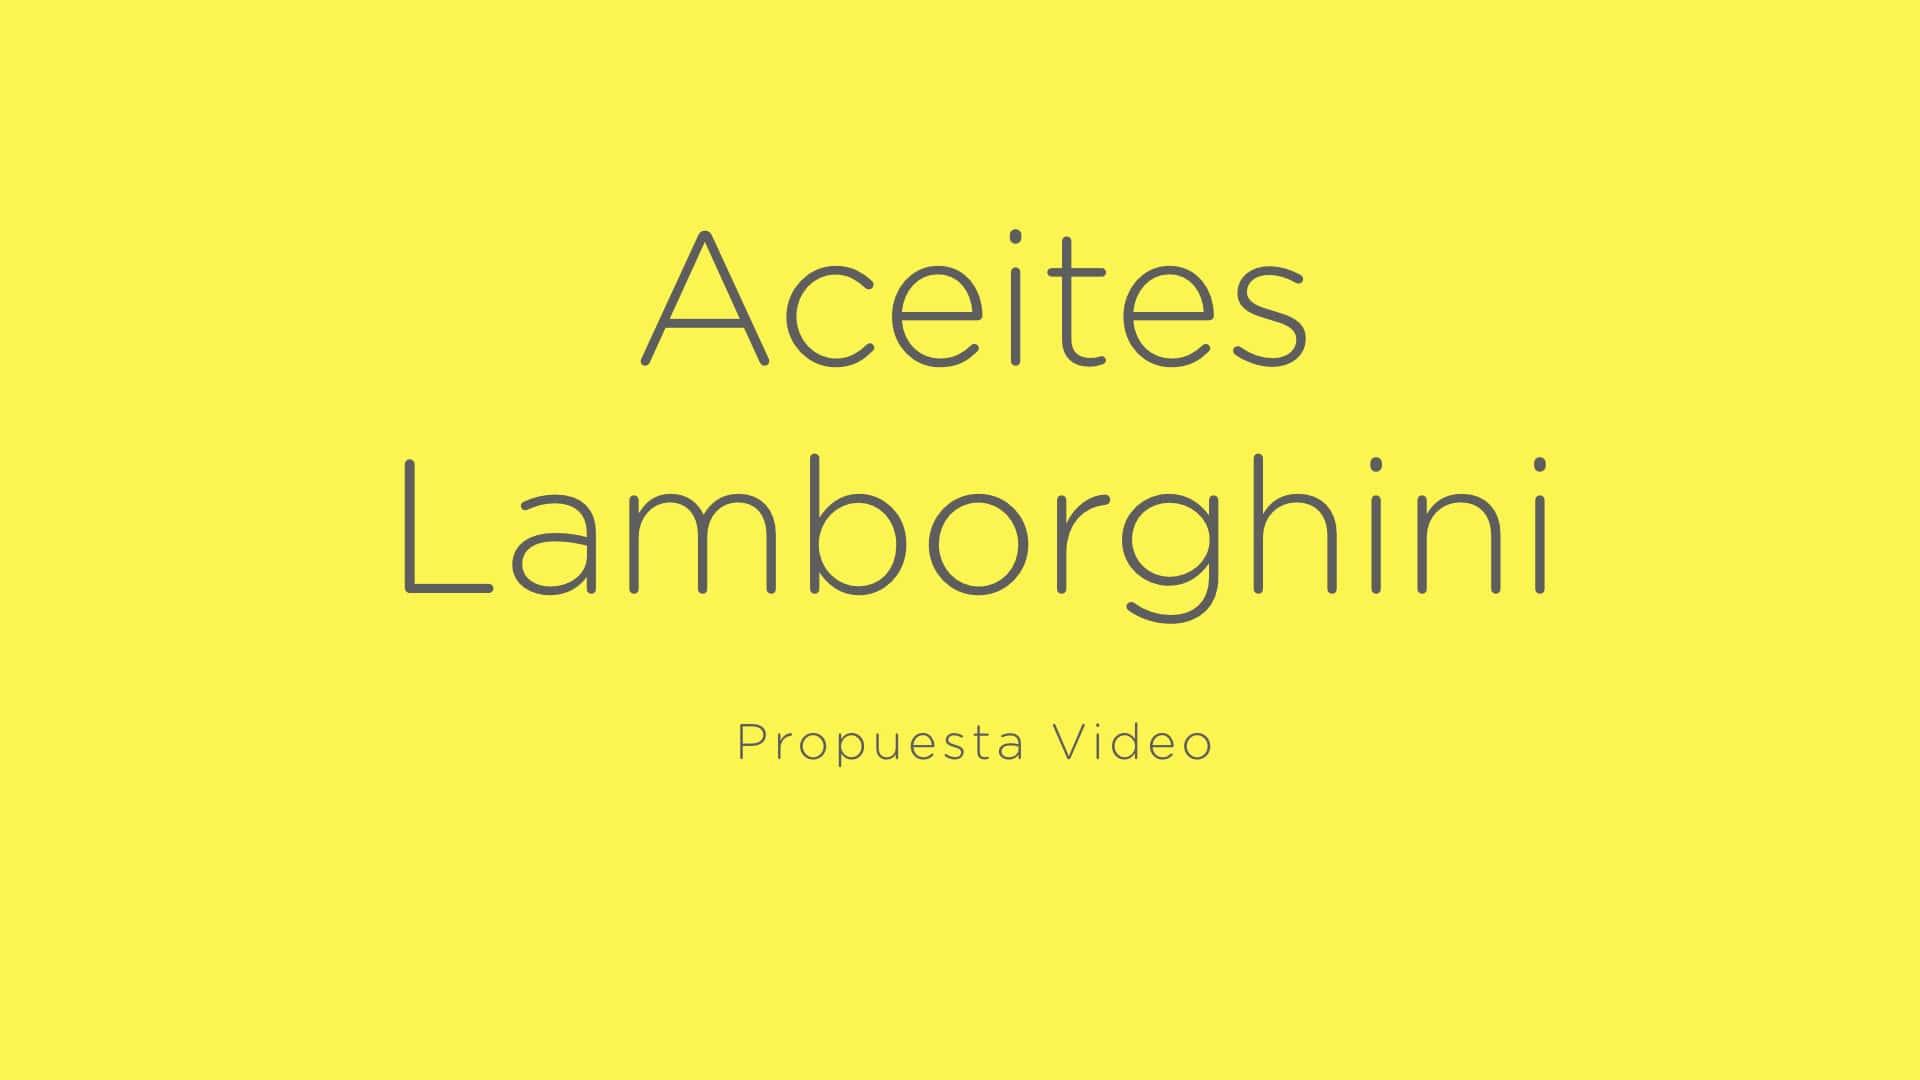 Propuesta Video_Aceites Lamborghini_V3 Costos.002-min.jpeg